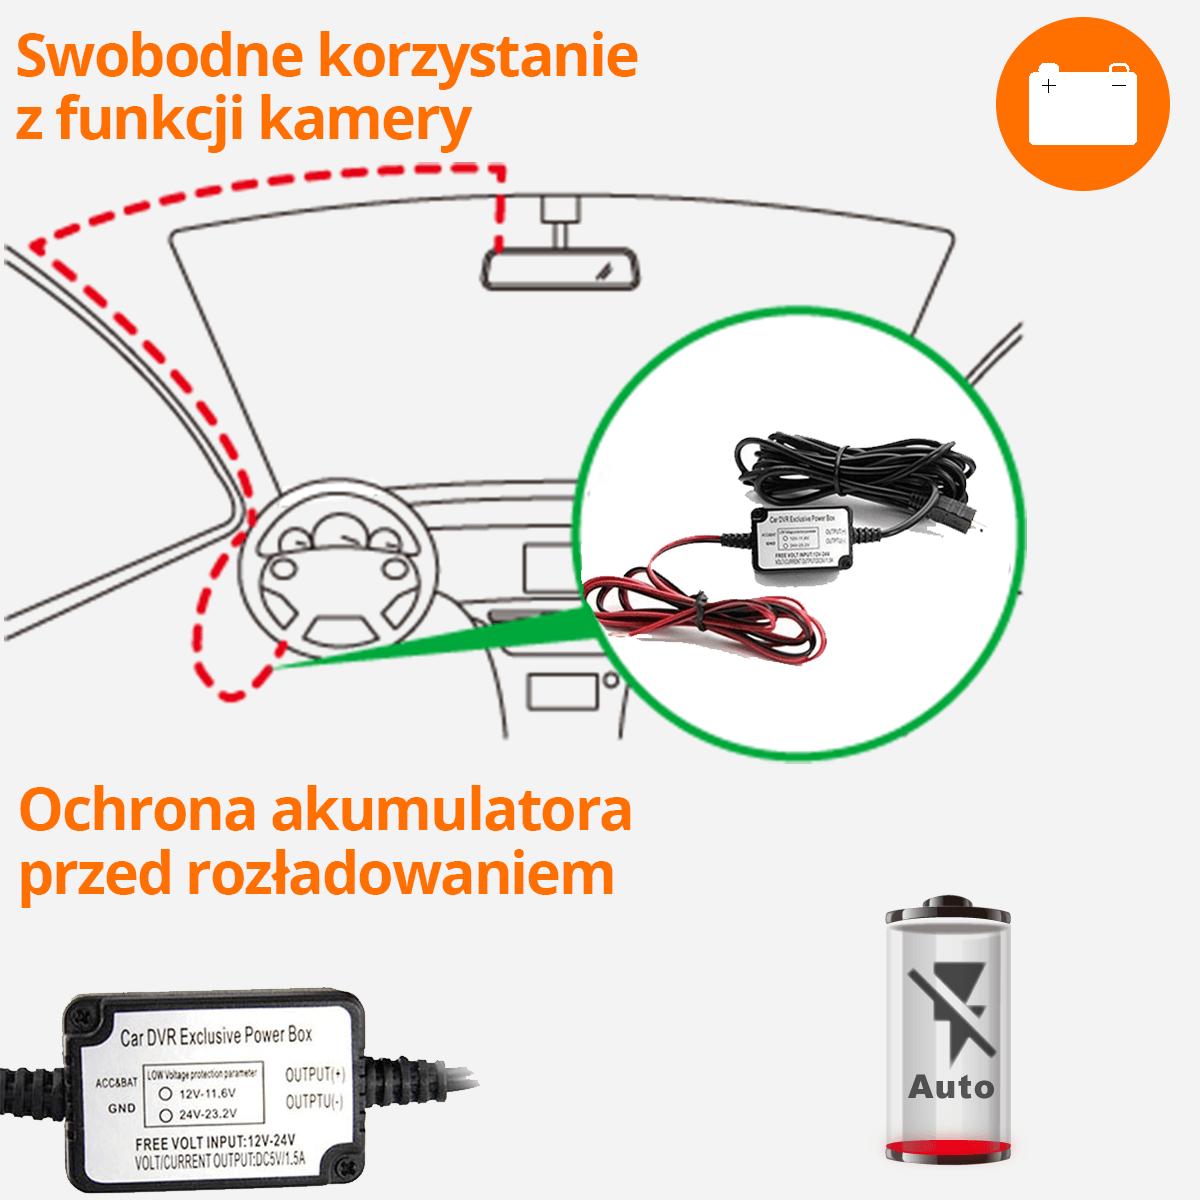 kamera-samochodowa-ochrona-akumulatora-orllo-pl